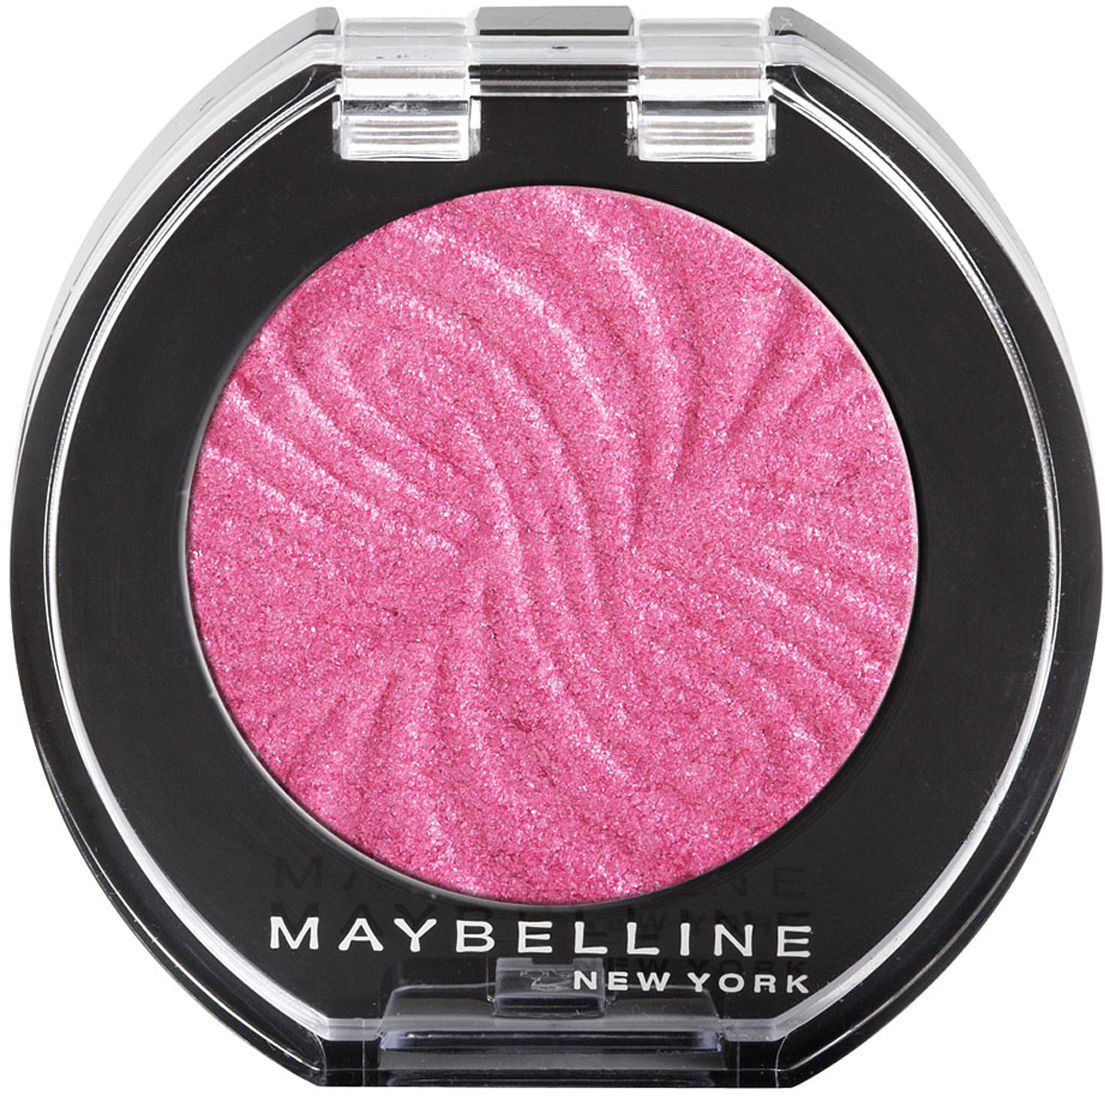 Maybelline New York тени для век Моно, цвет: Блестки 31, Розовый, 3 мл fit me maybelline new york